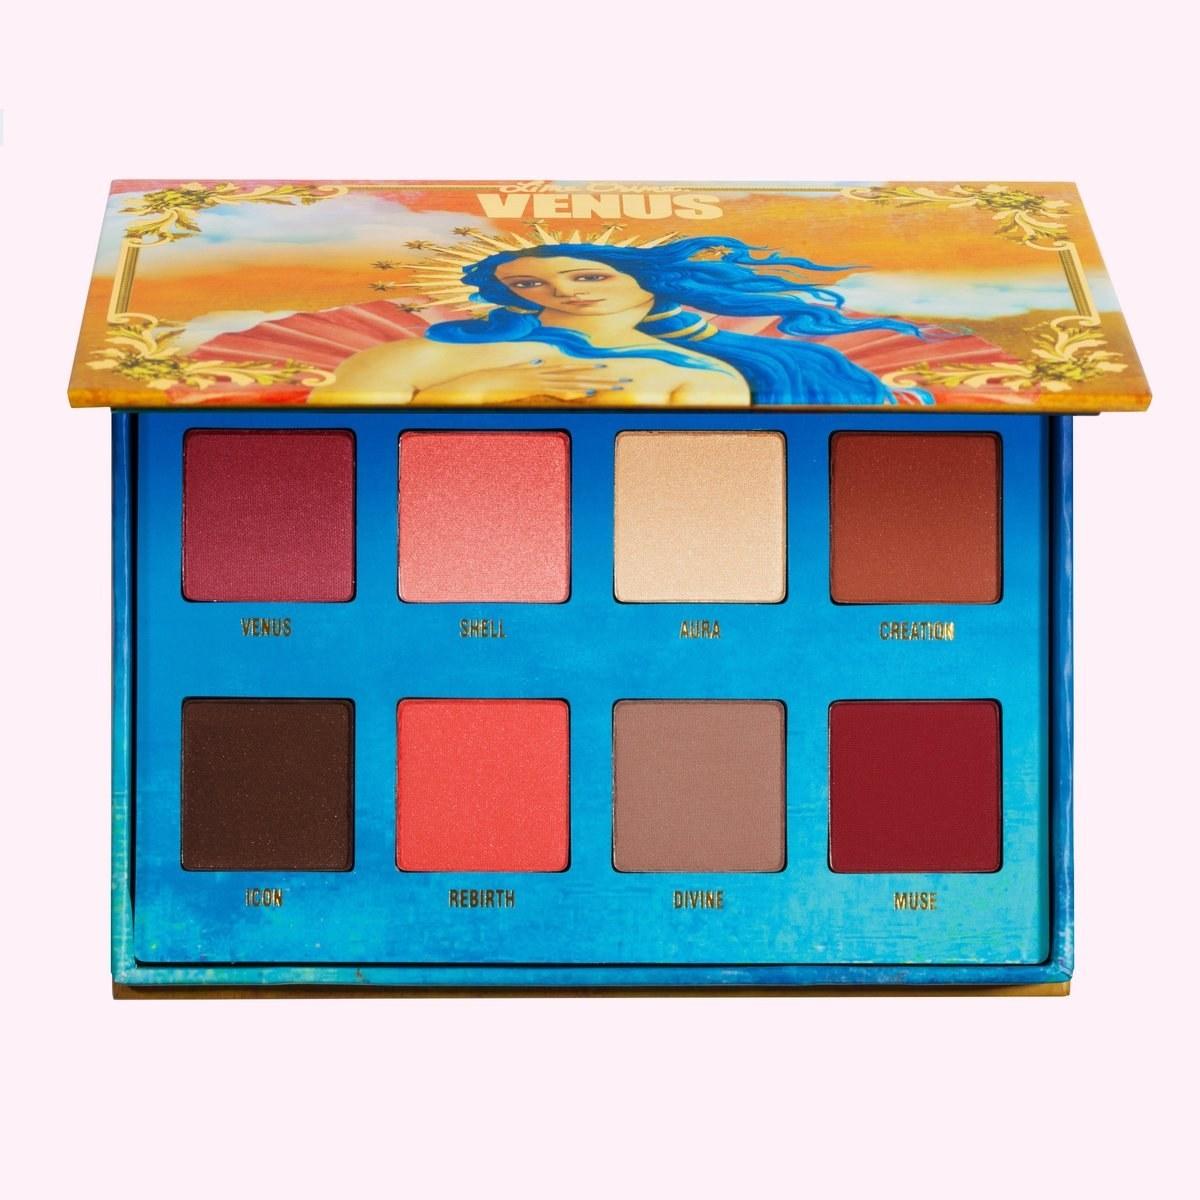 a venus themed eyeshadow palette